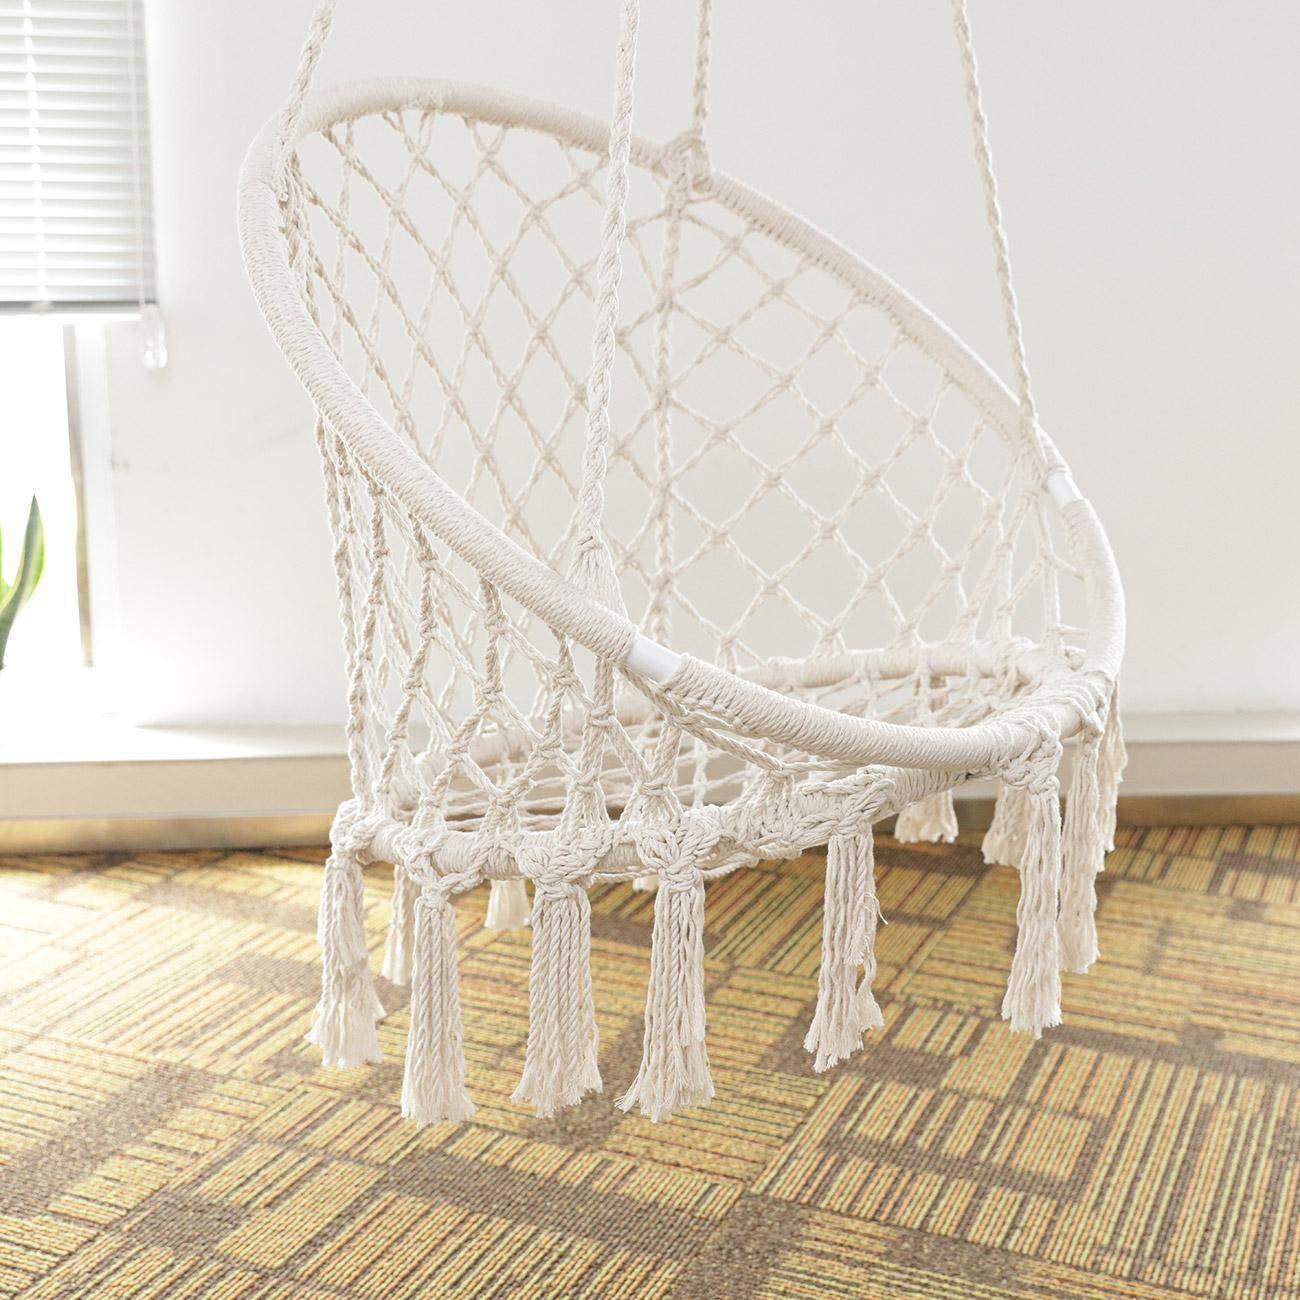 BEAMNOVA 265 lbs Capacity Hammock Chair with Hanging Hardware for Indoor Outdoor Beige by BEAMNOVA (Image #3)